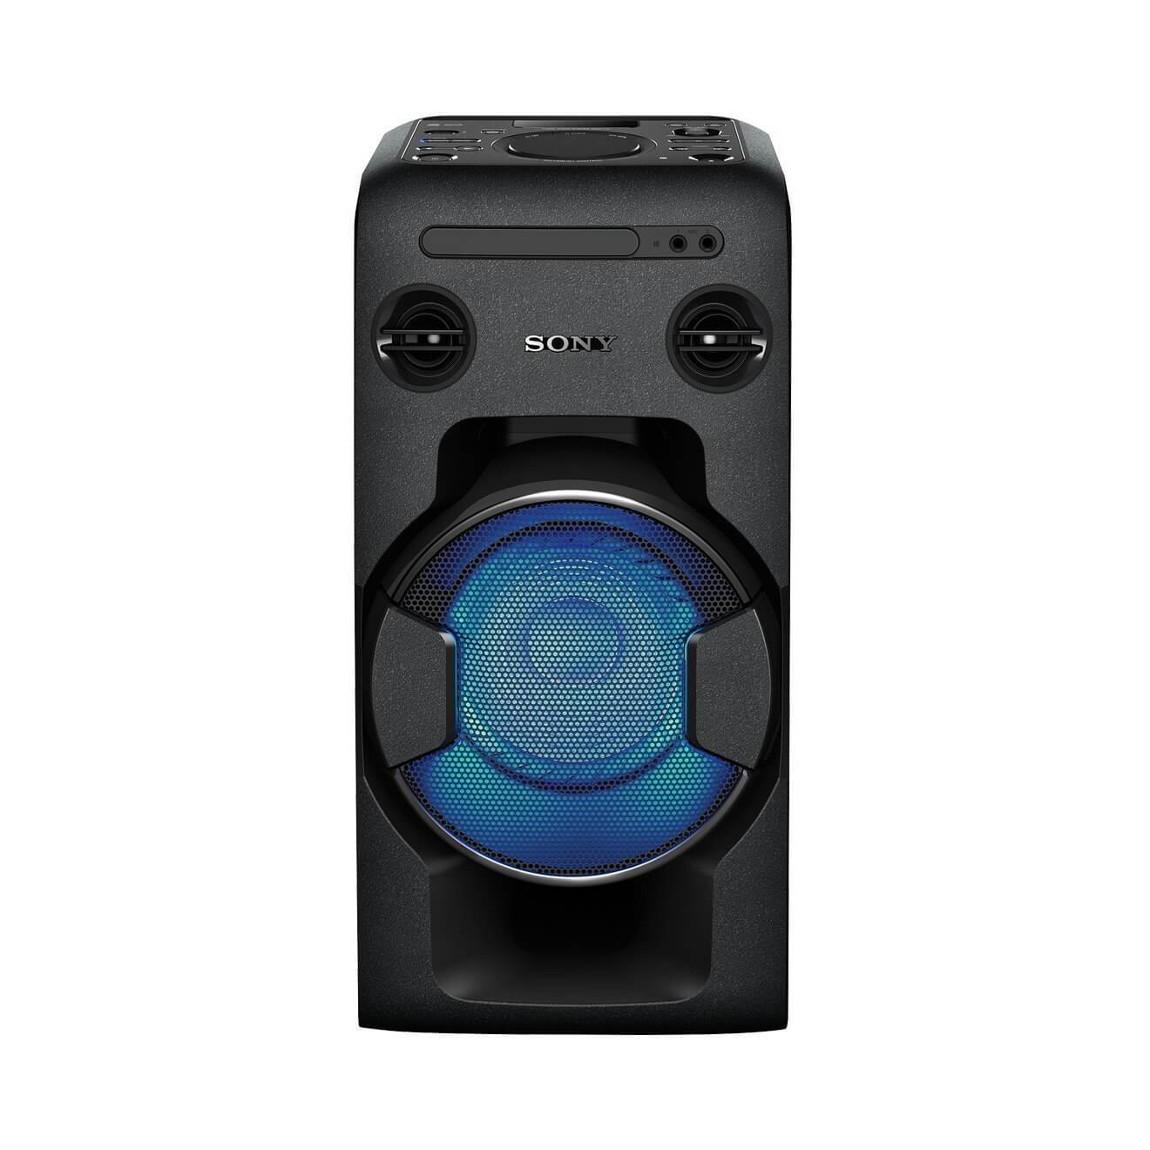 Sony MHCV11 - Party-Bluetooth-Lautsprecher